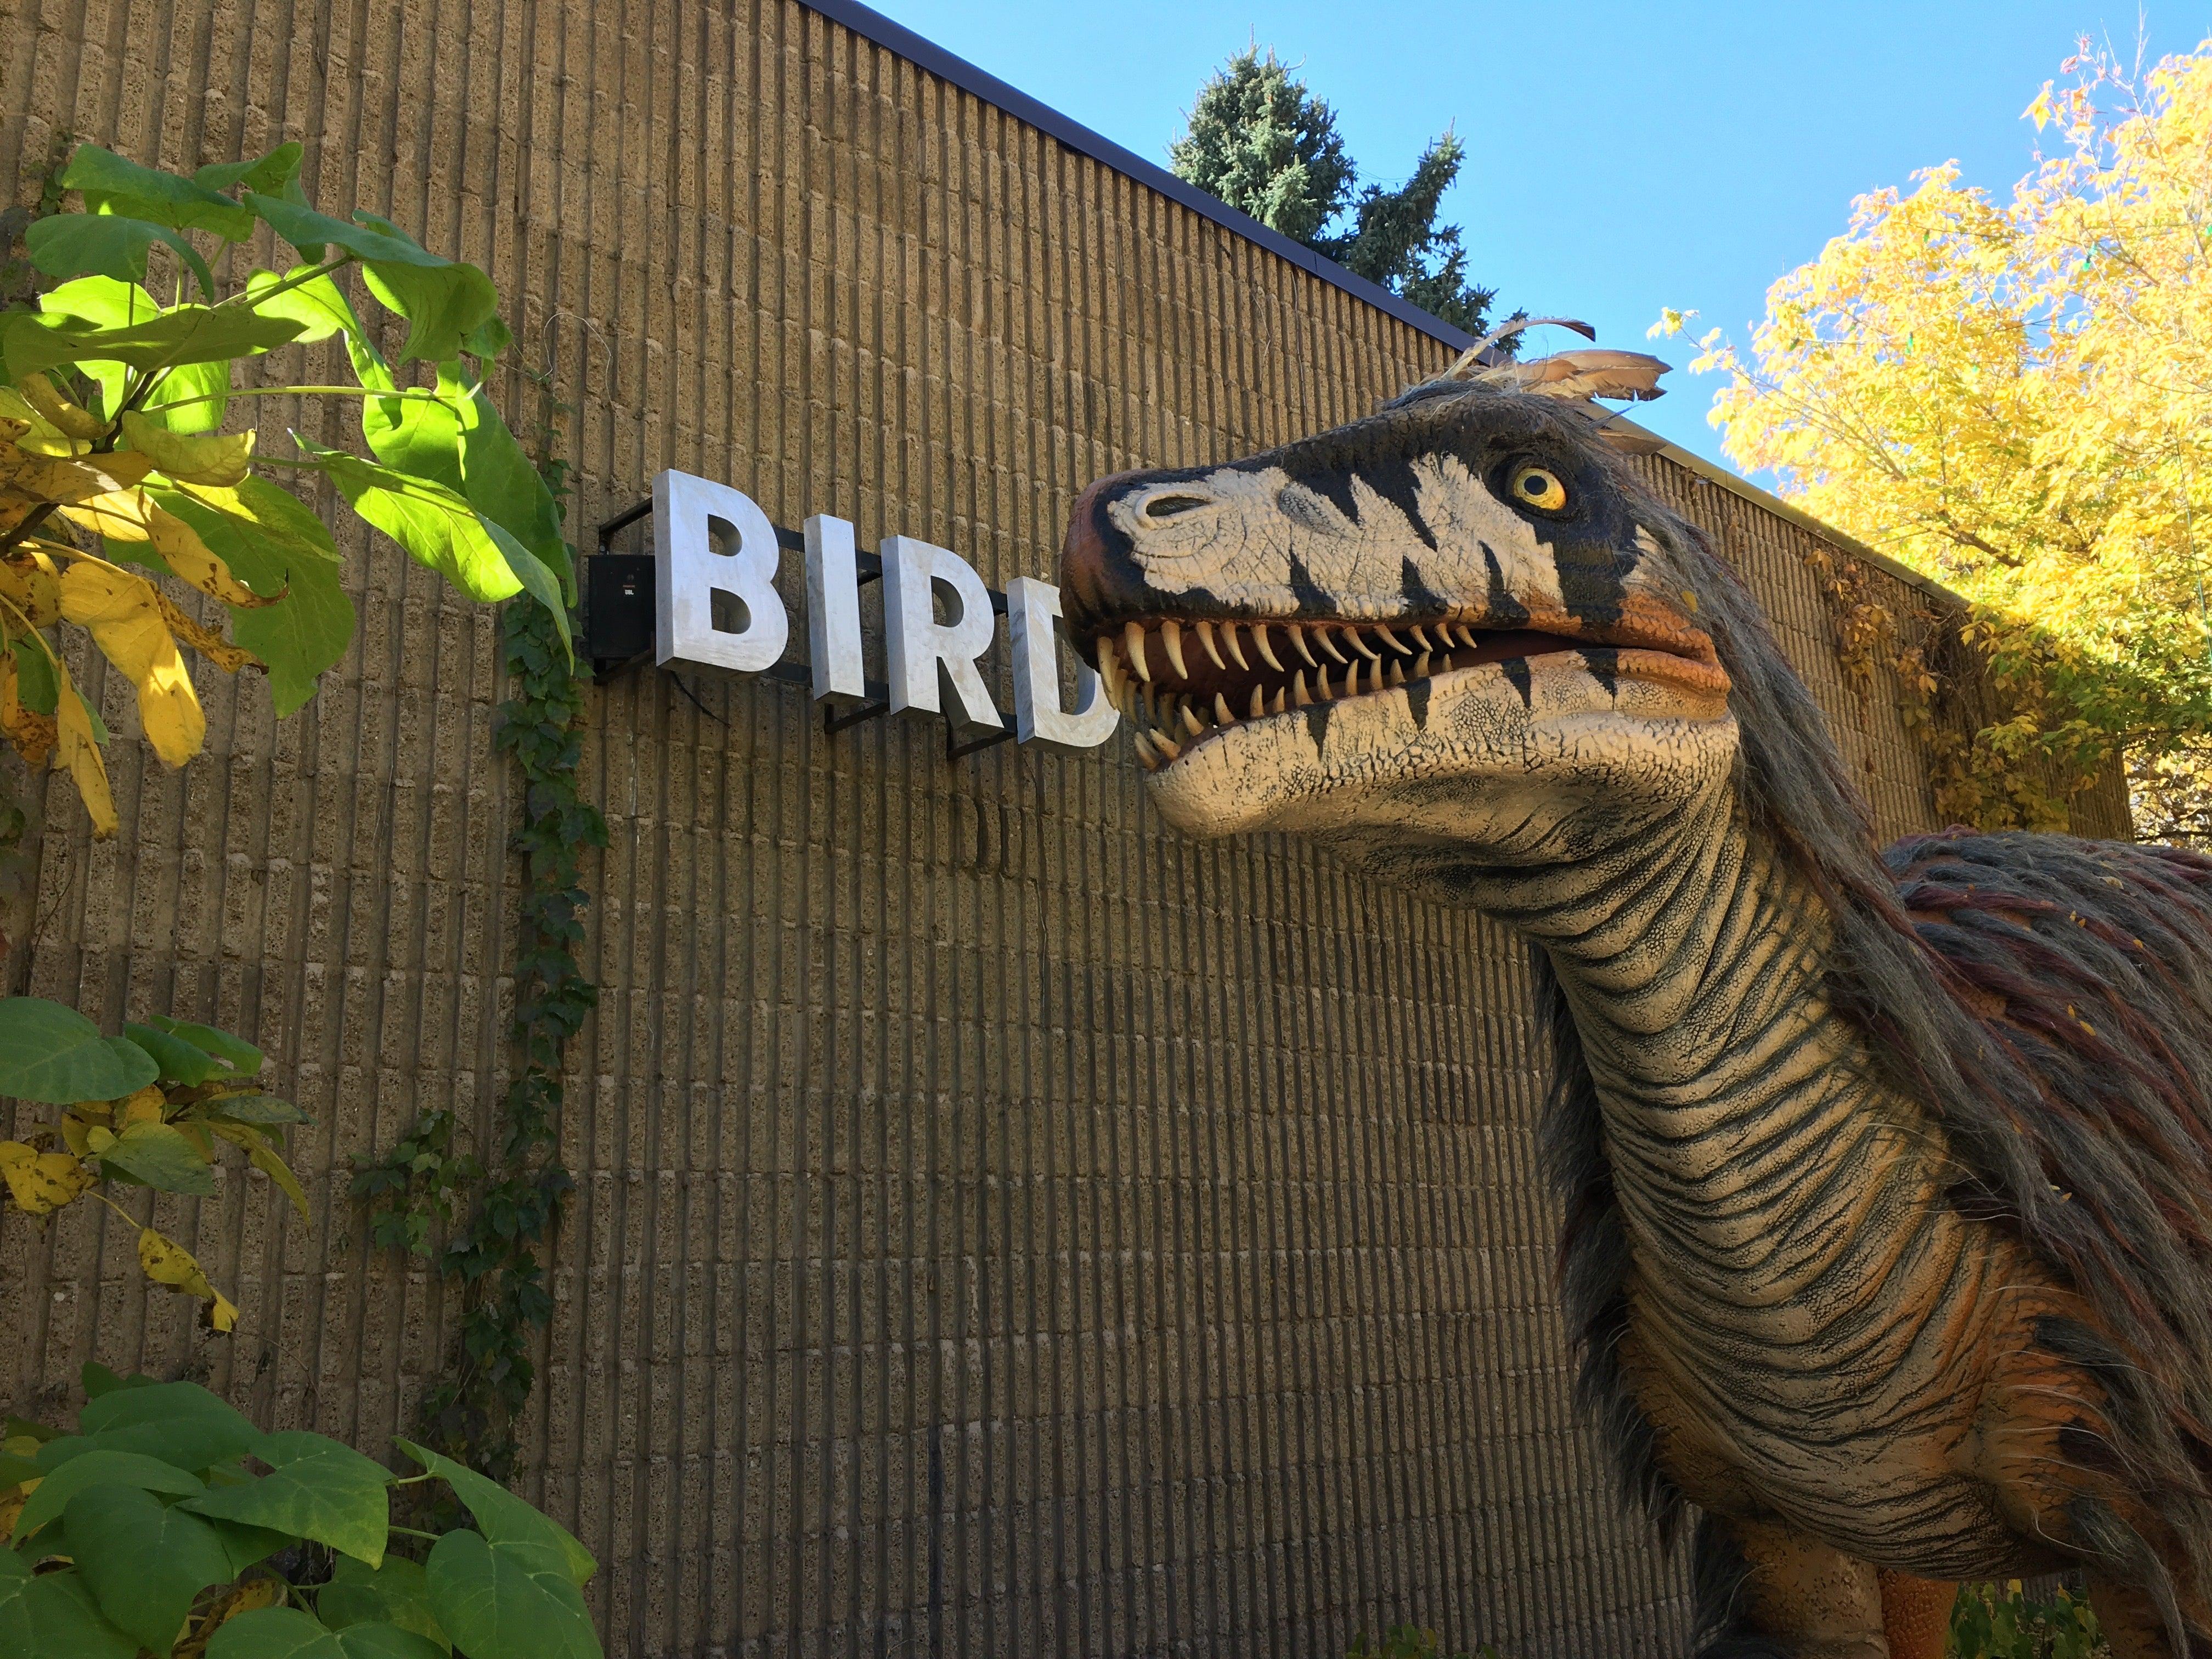 Some Dinosaurs Regurgitated Pellets Just Like Birds